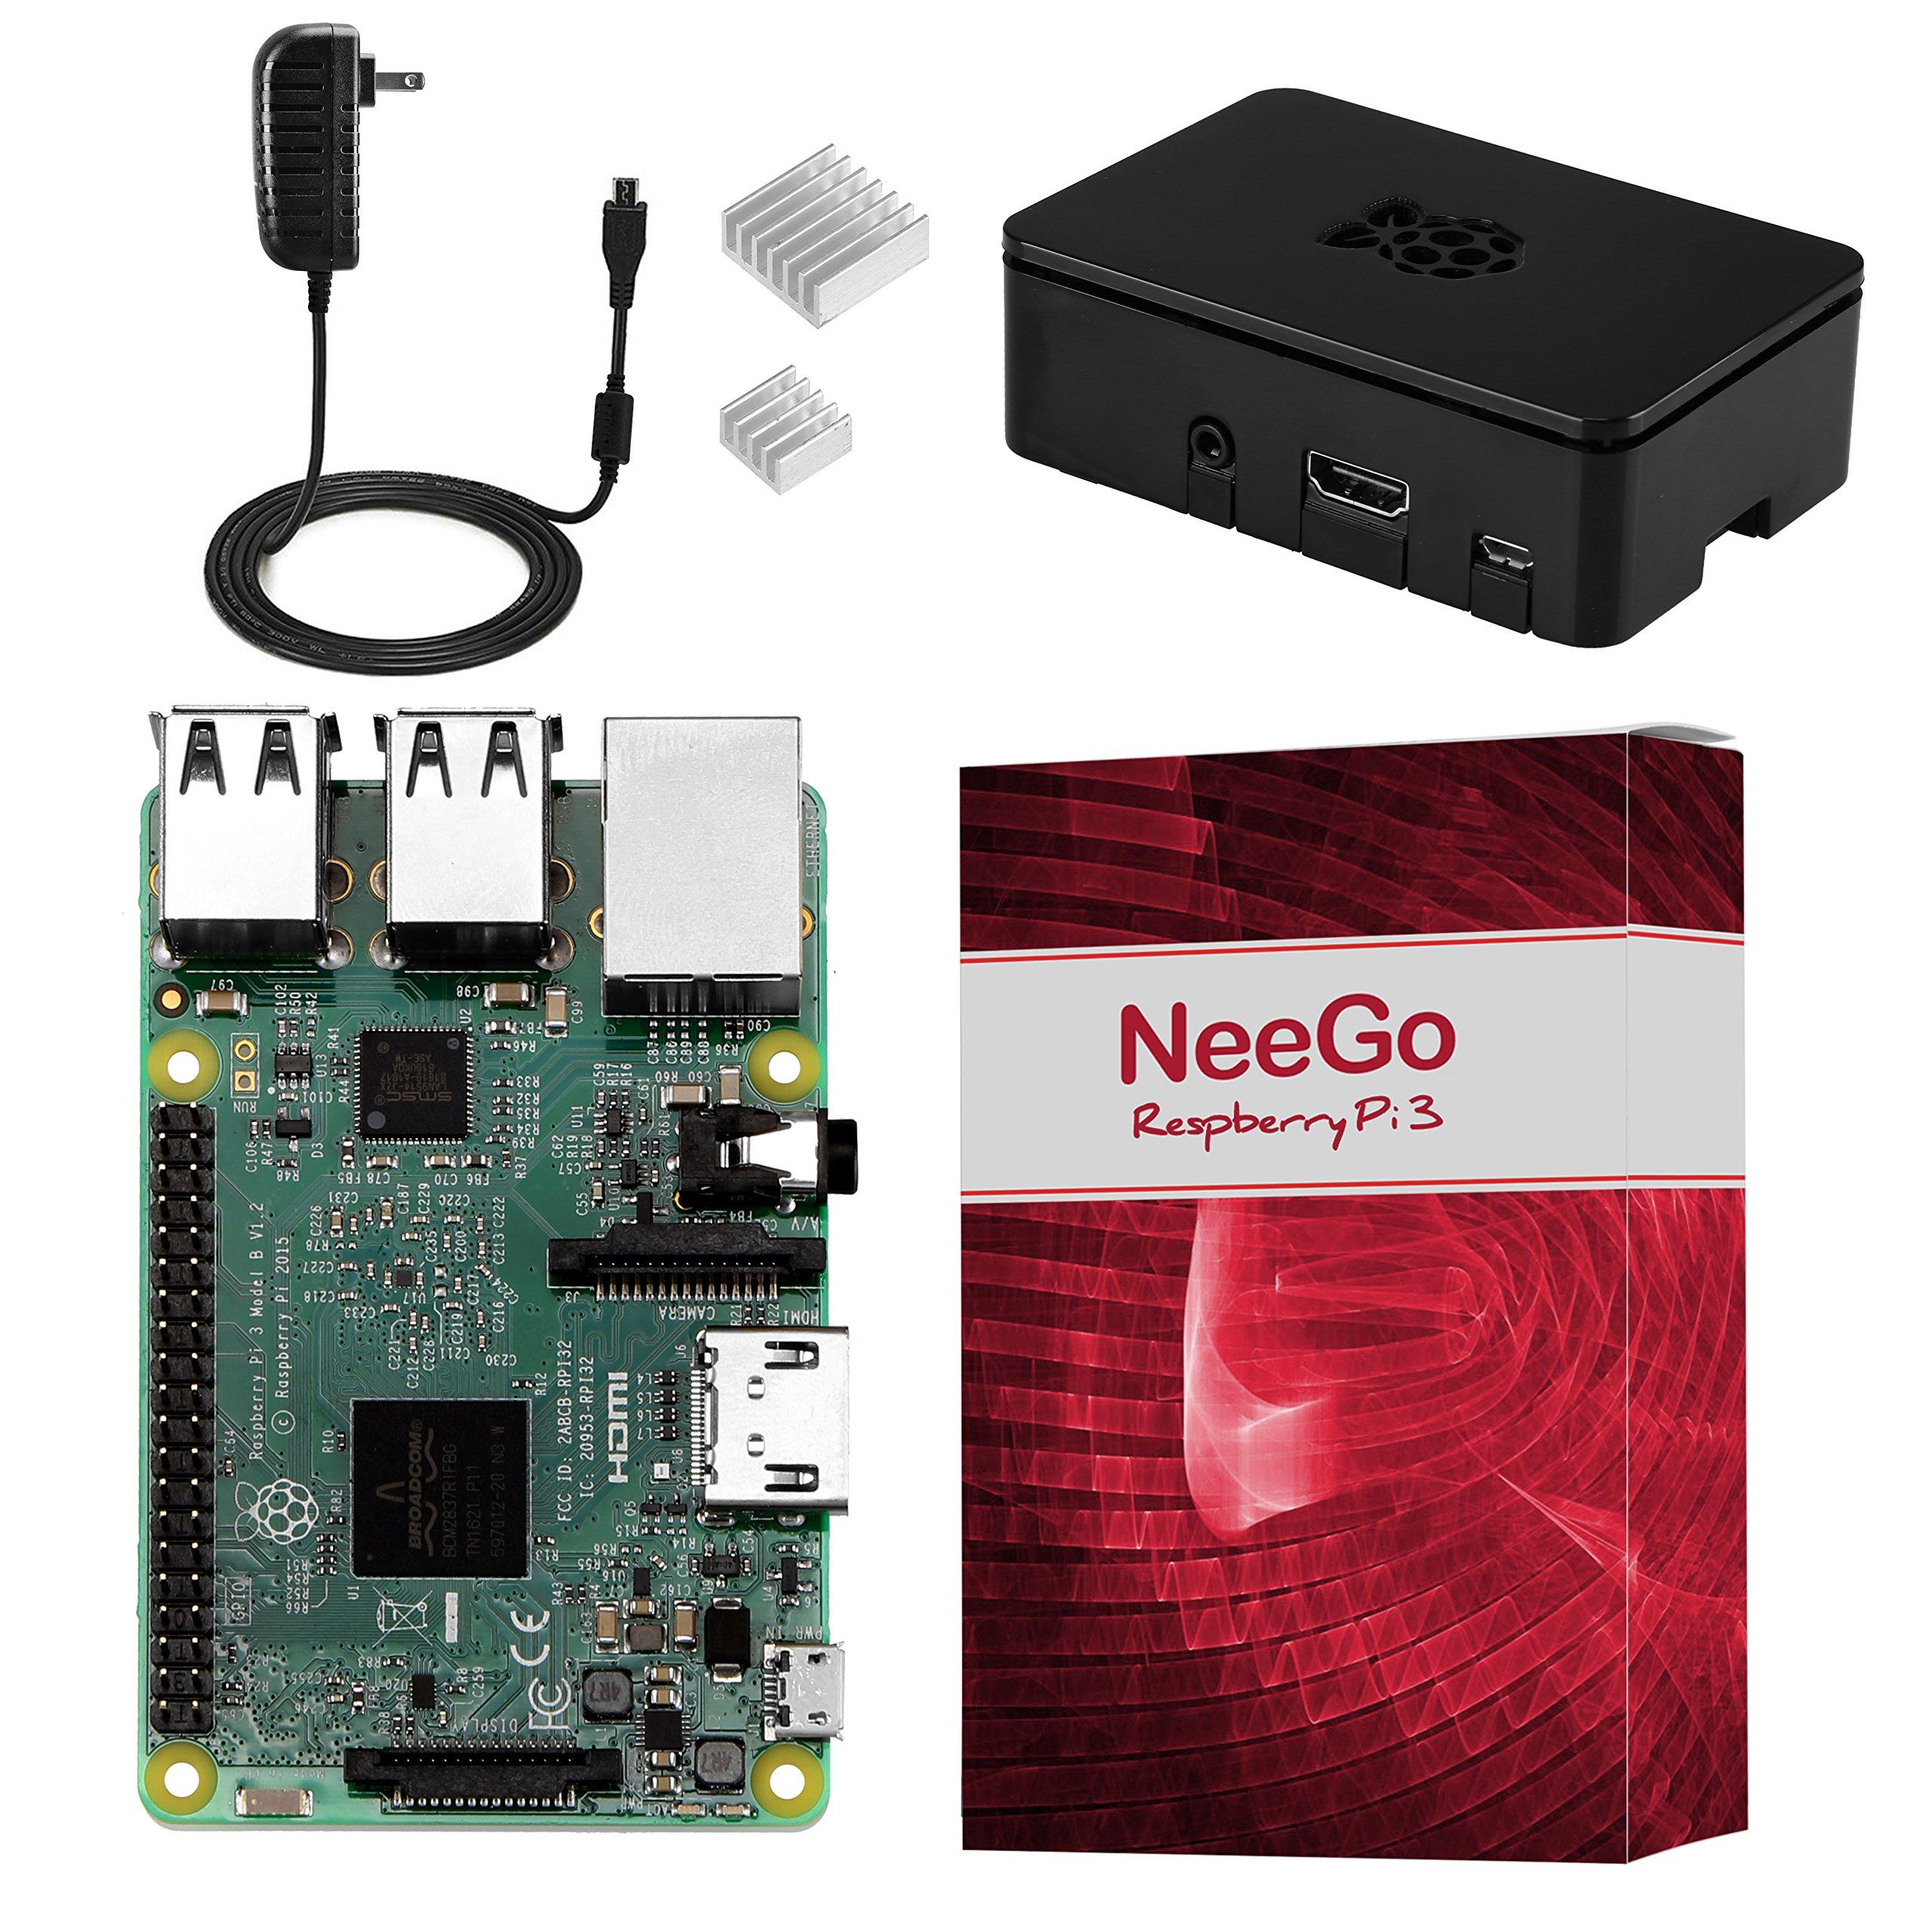 NeeGo Raspberry Pi 3 Kit Pi 3 Model B Barebones Computer Motherboard with 64bit Quad Core CPU & 1GB RAM, Black Pi3 Case, 2.5A Power Supply & Heatsink 2-Pack by NeeGo (Image #1)